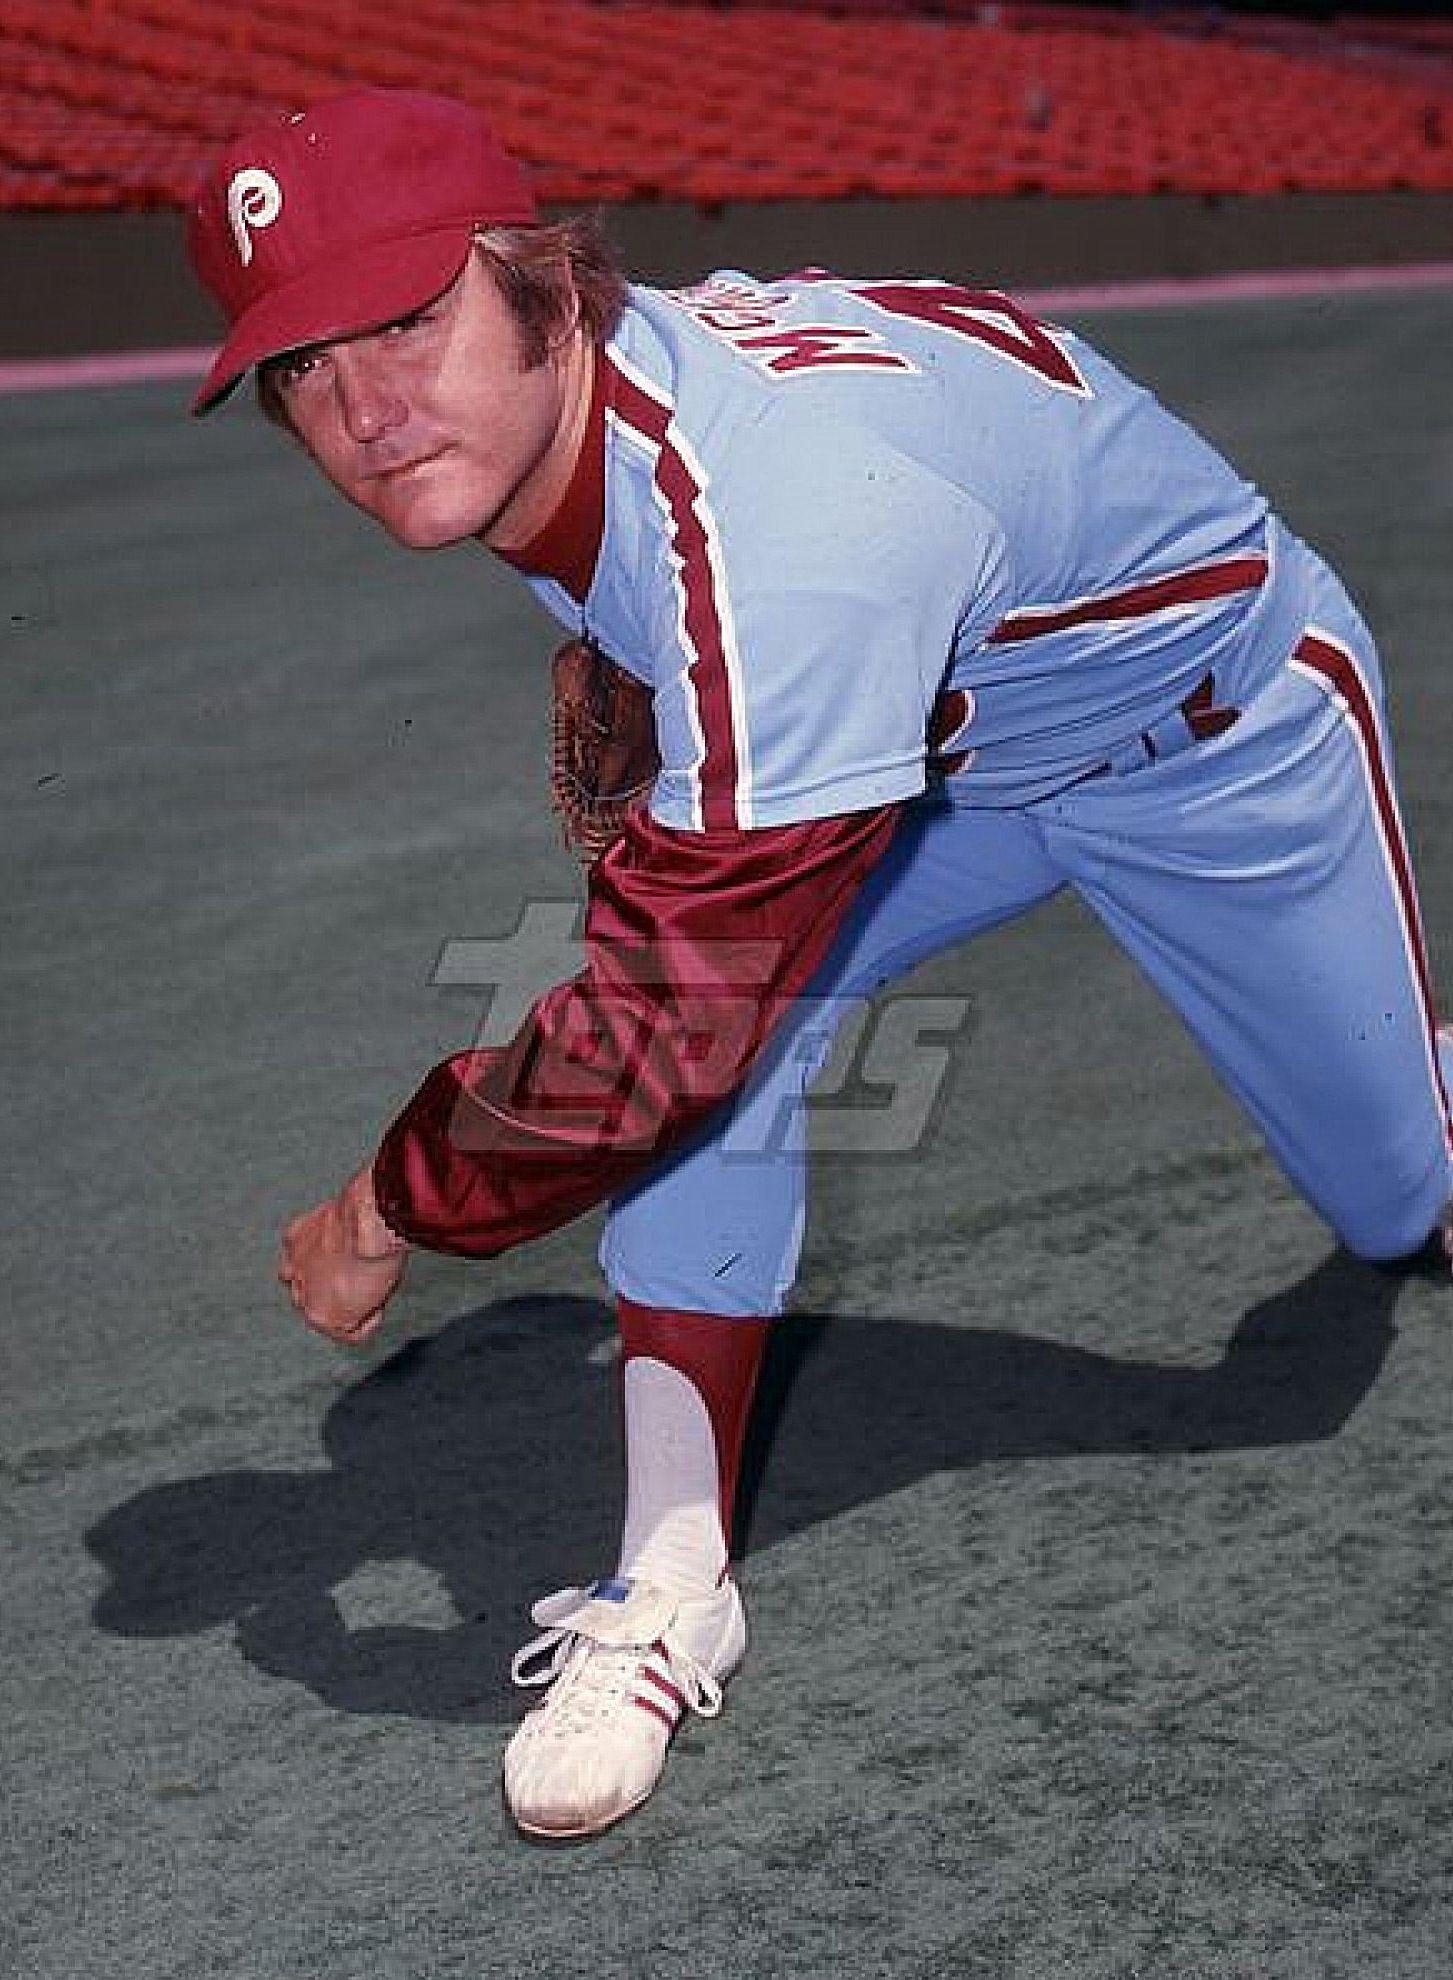 Tug Mcgraw Philadelphia Phillies Baseball Phillies Baseball